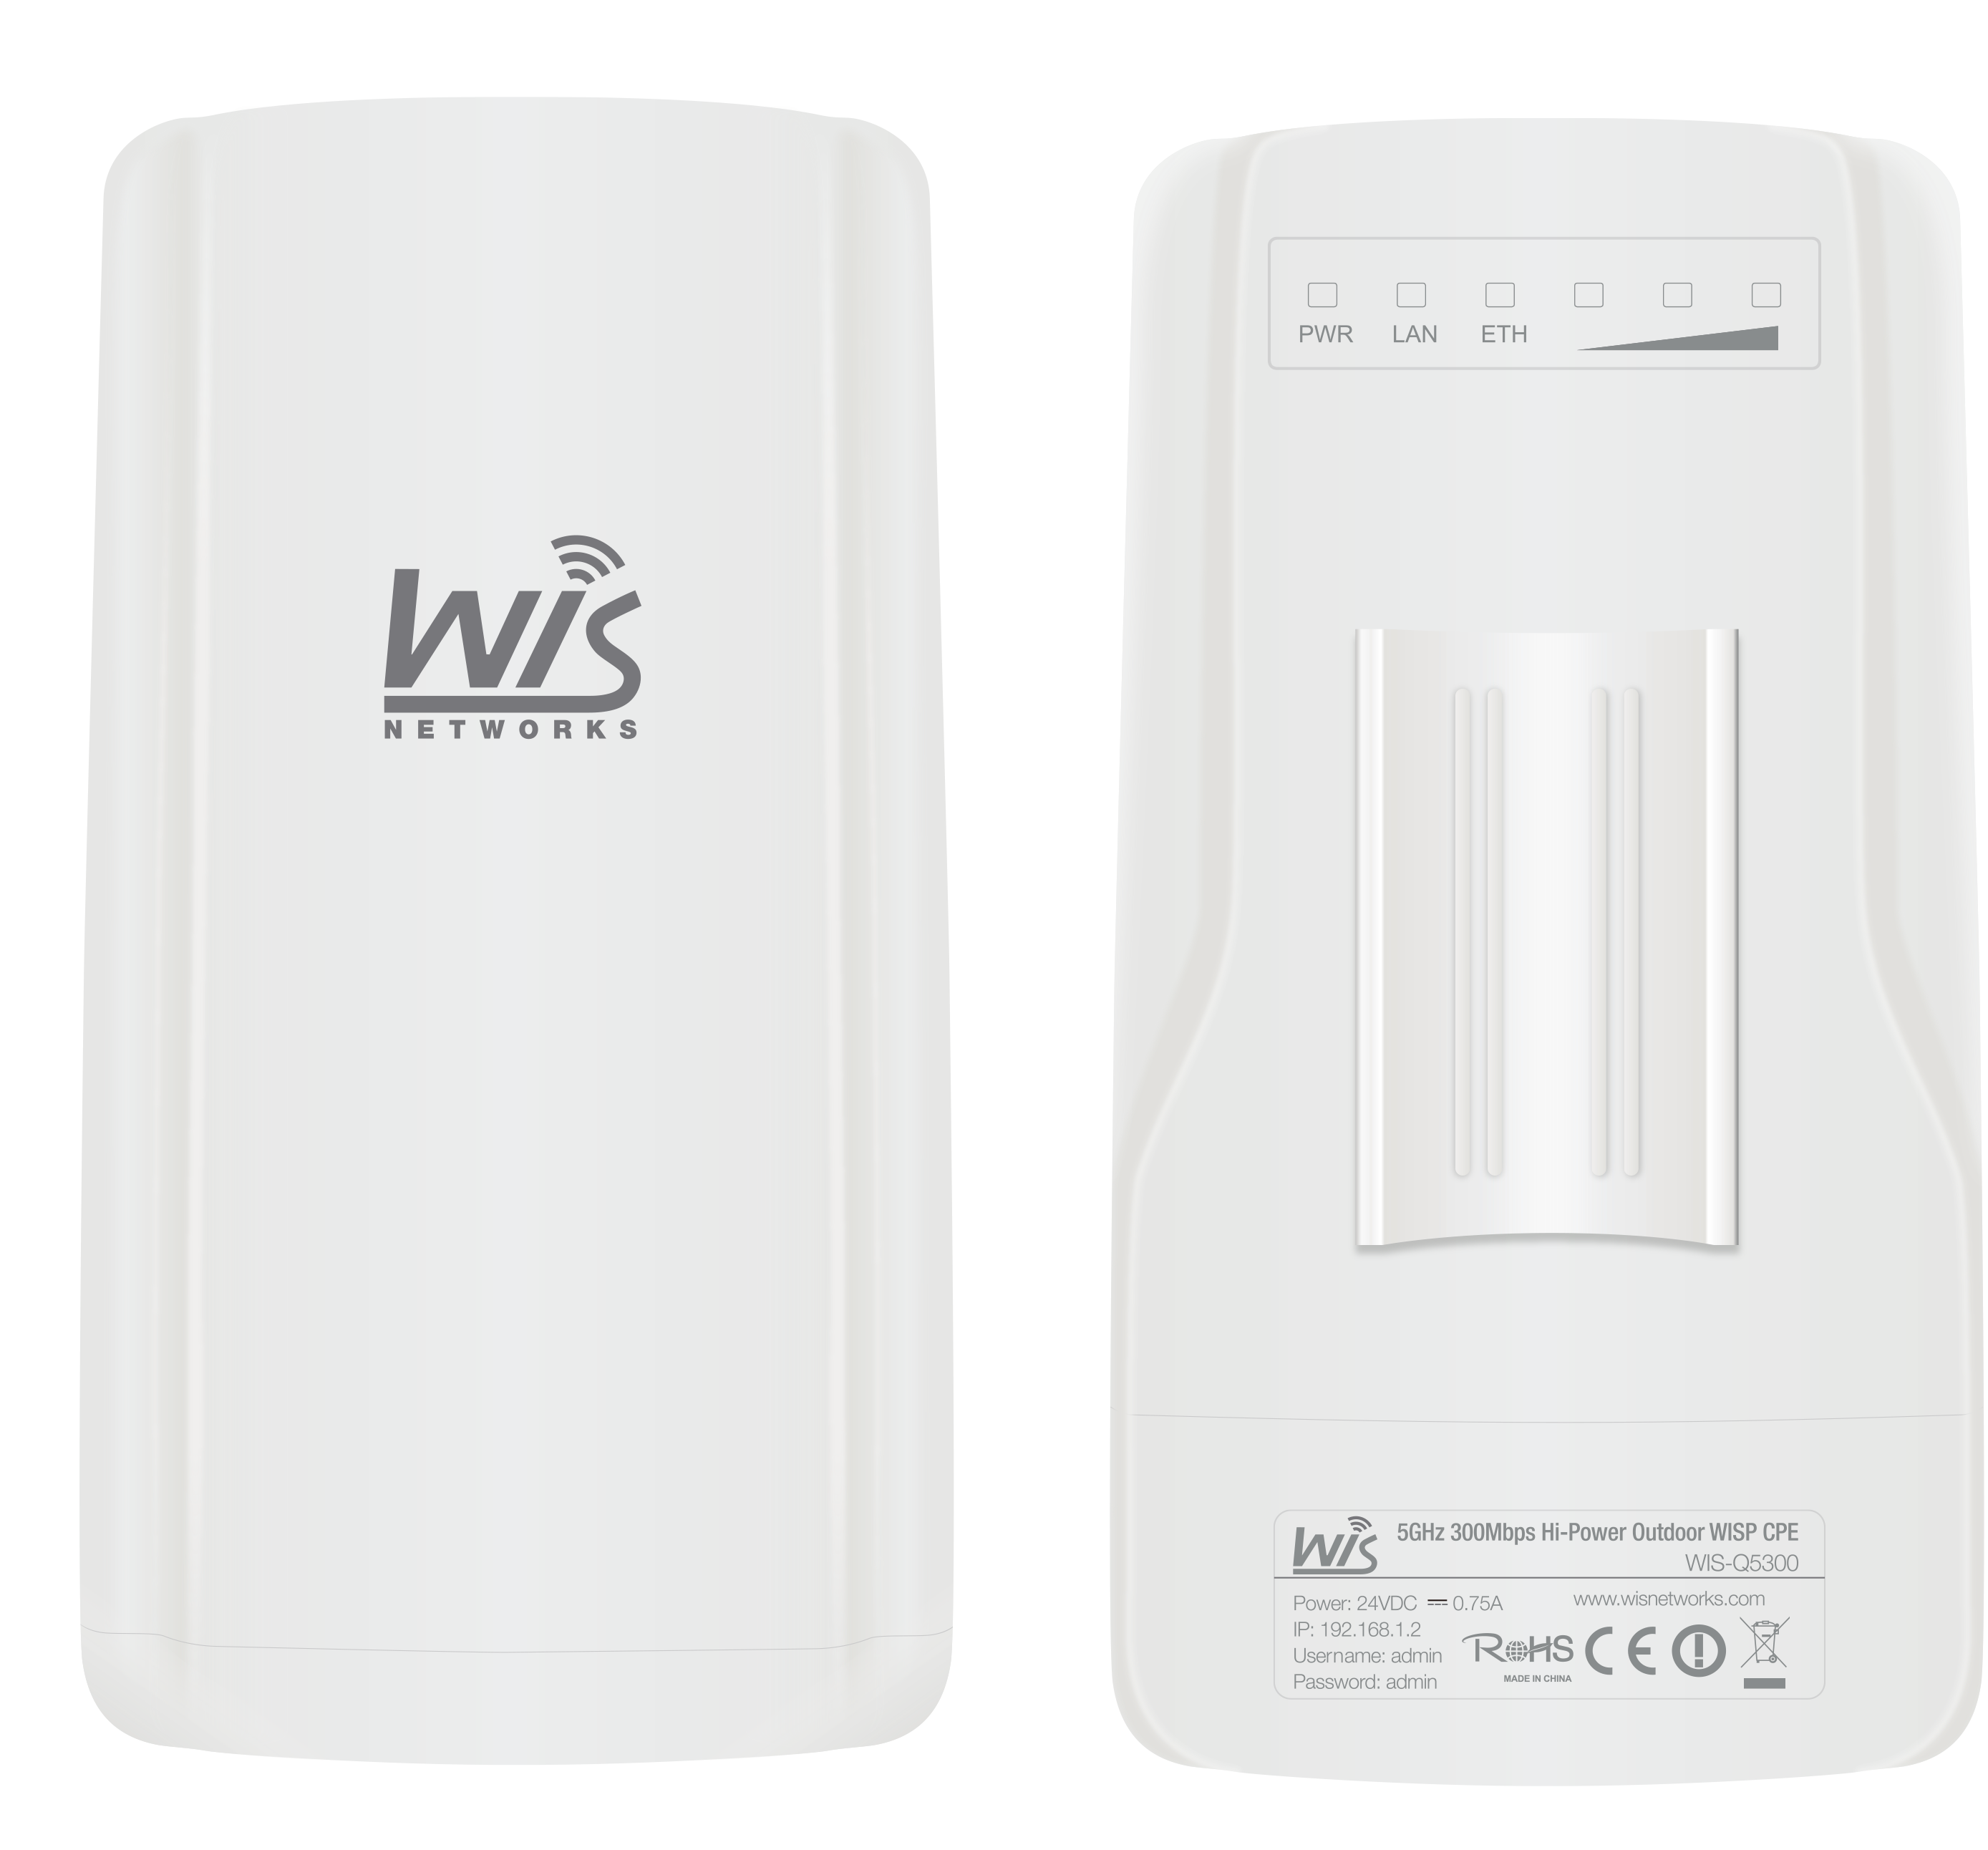 Access Point Outdoor WIS (Q5300) Wireless N300